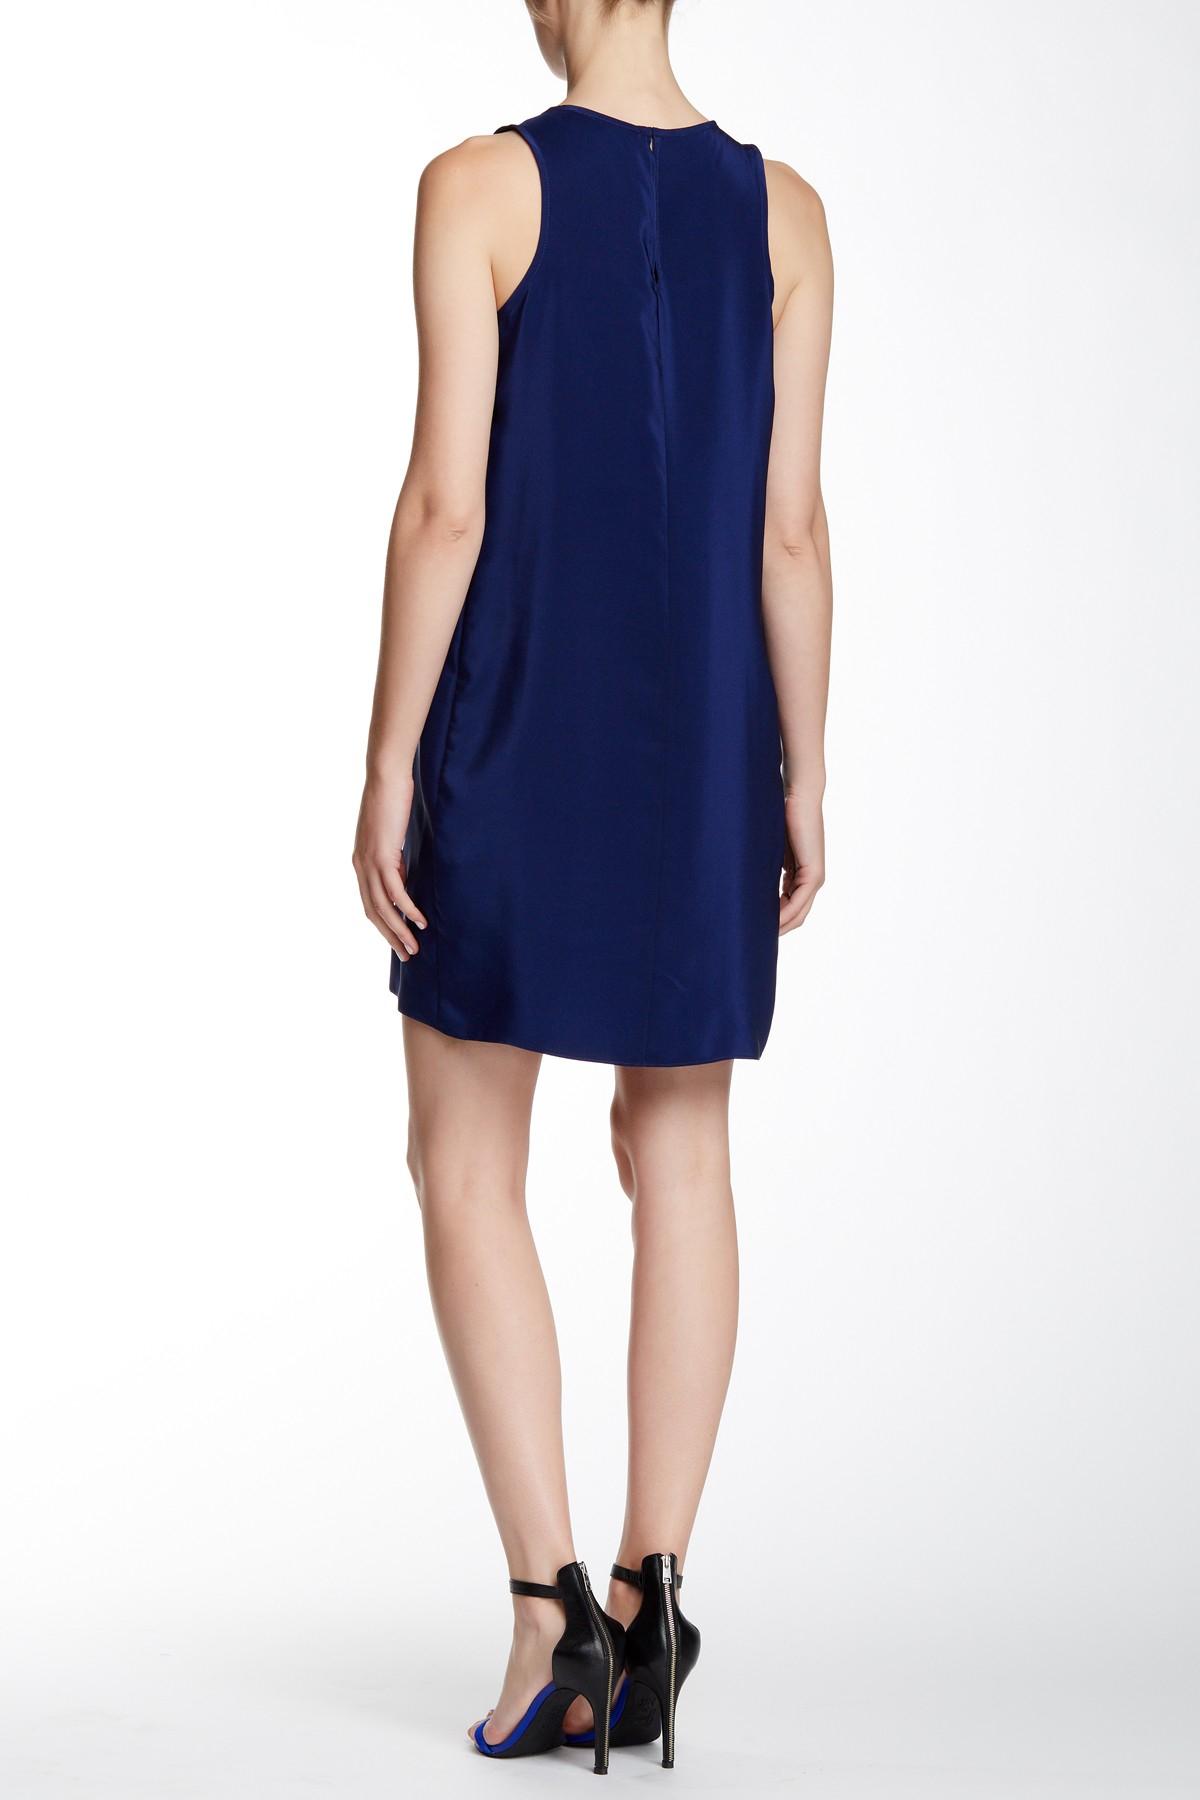 Amanda uprichard diamond silk dress in blue lyst for Diamond and silk t shirts